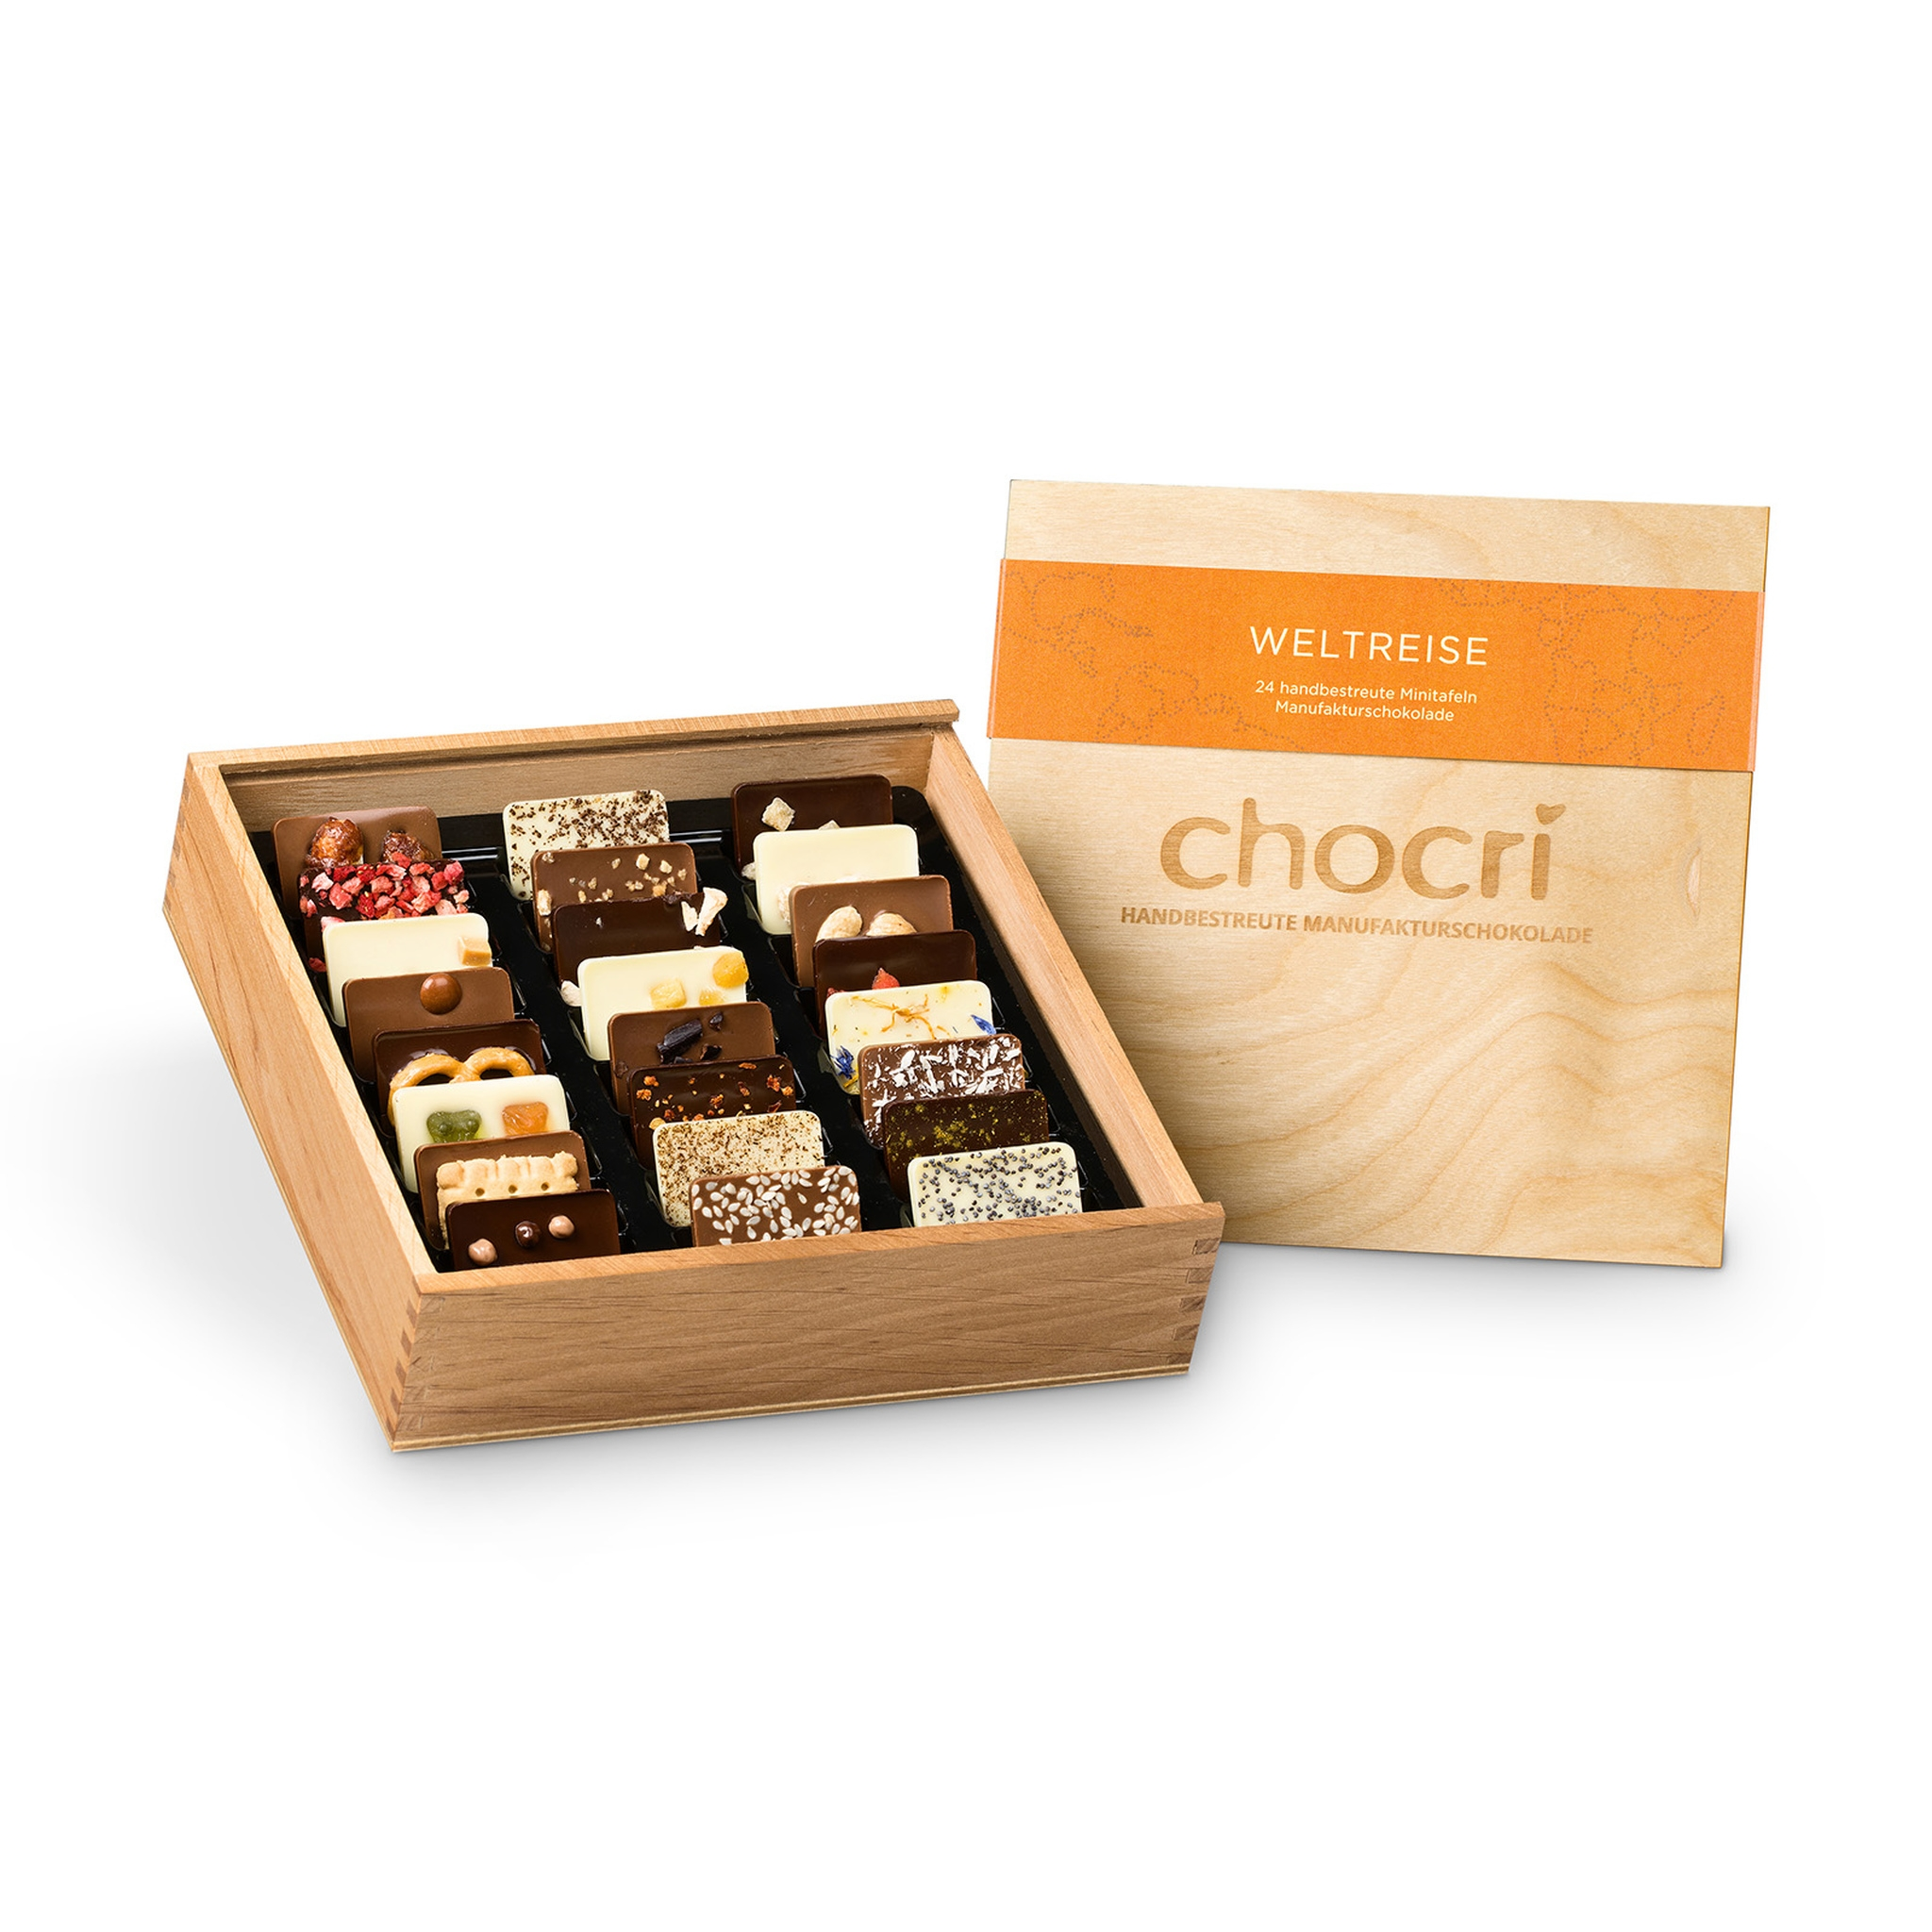 Köstlichsüsses - chocri Weltreise® 'Klassik' Mini Schokoladentafeln in Holz Box - Onlineshop Chocri